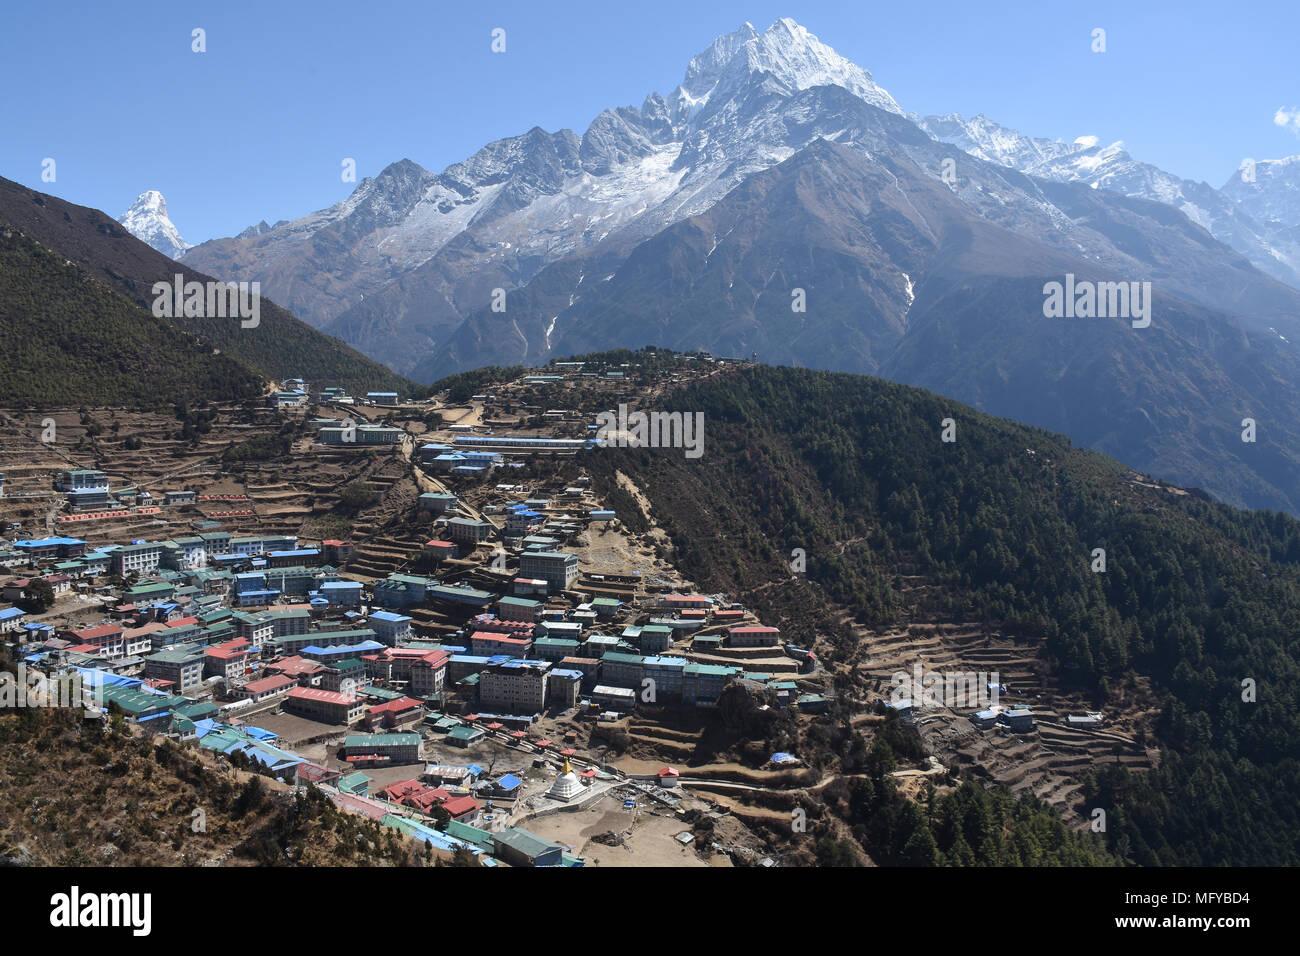 Namche Bazaar and Thamserku, Nepal - Stock Image